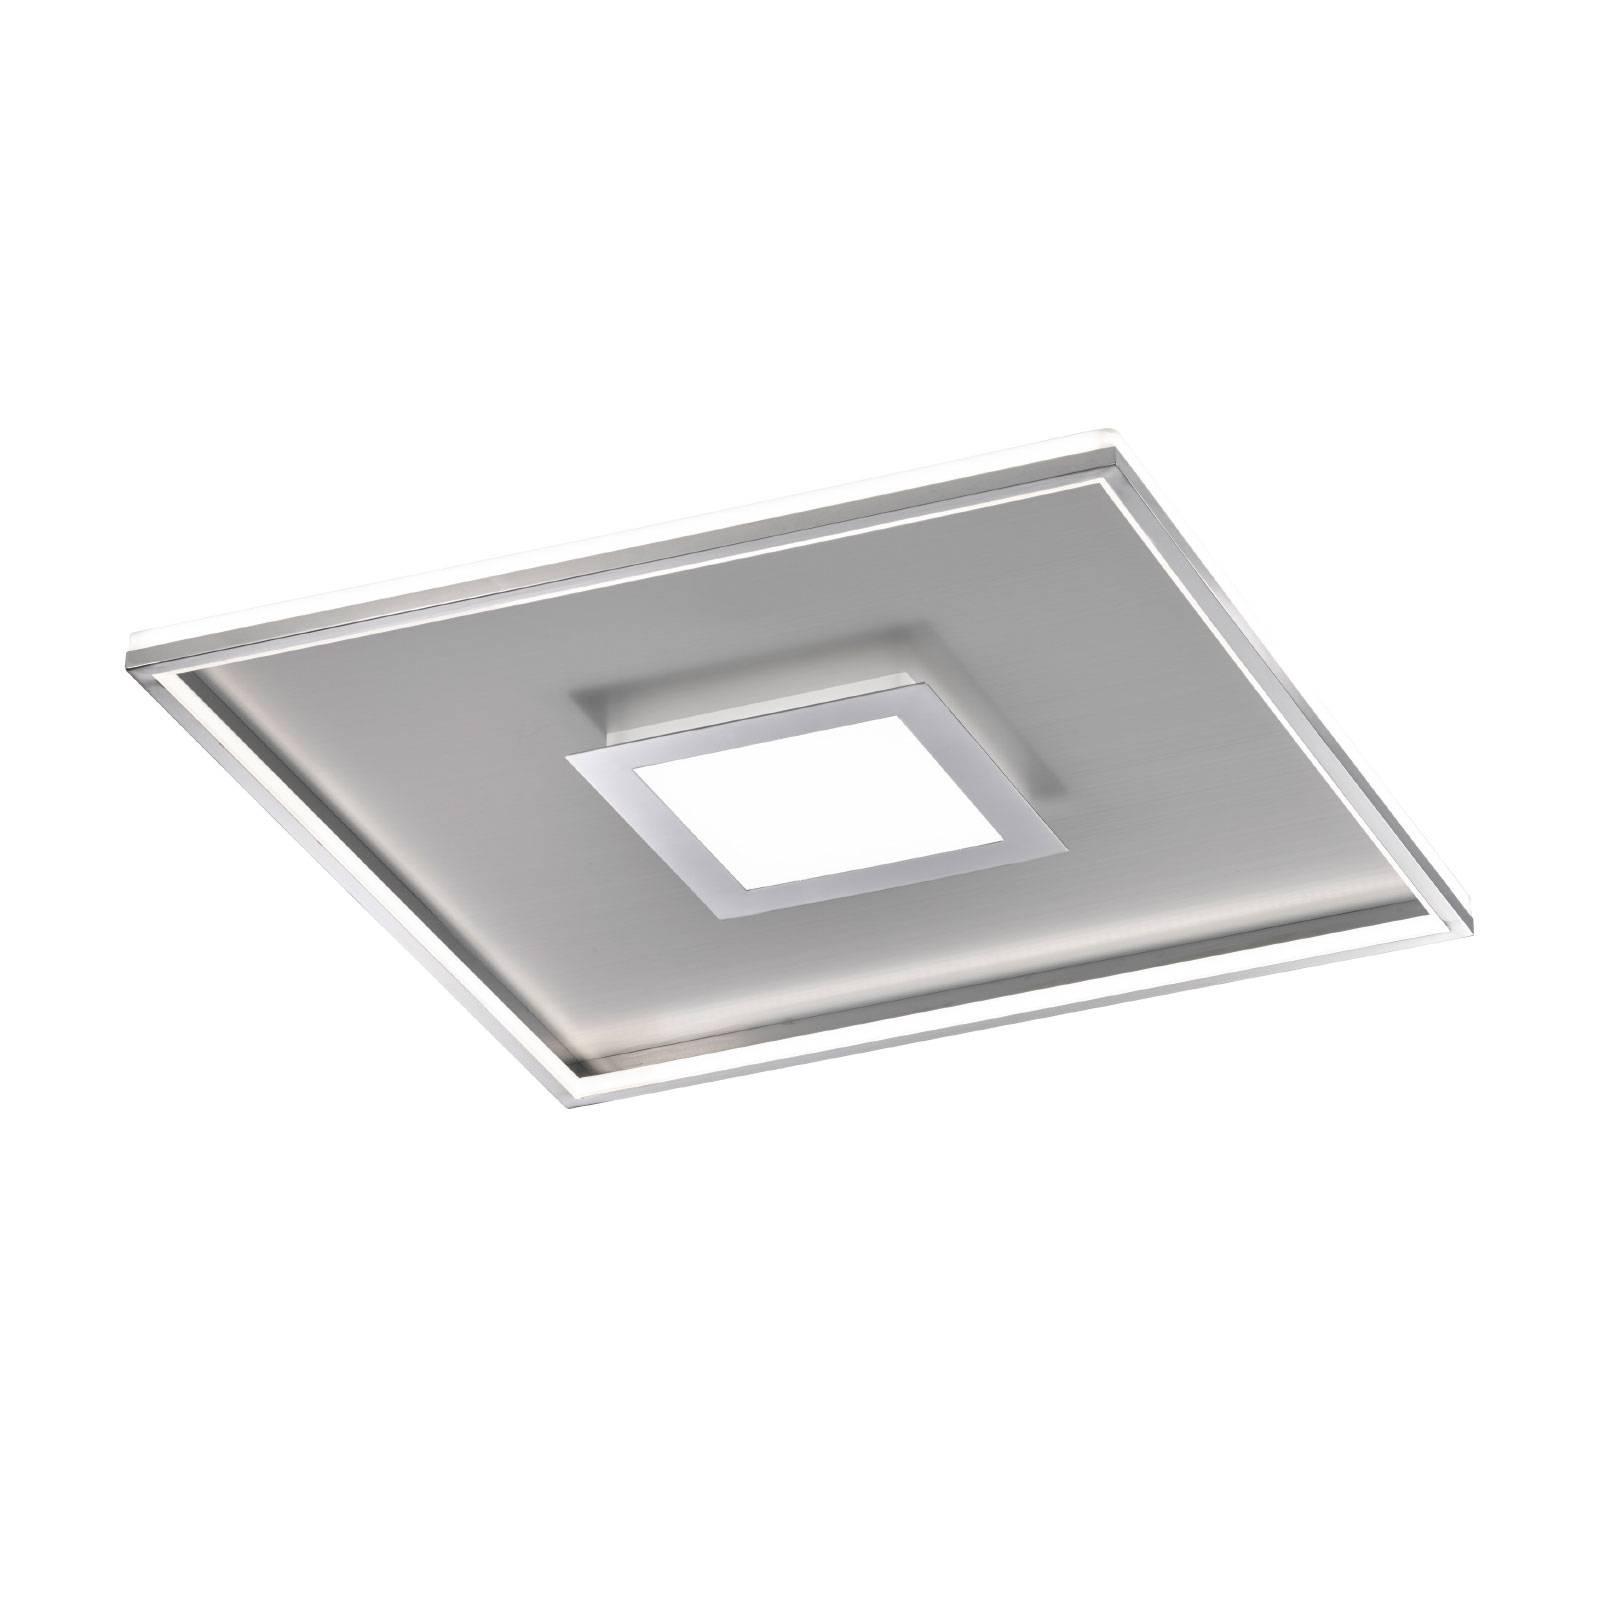 Plafoniera LED Zoe quadrata, cromo 60x60 cm